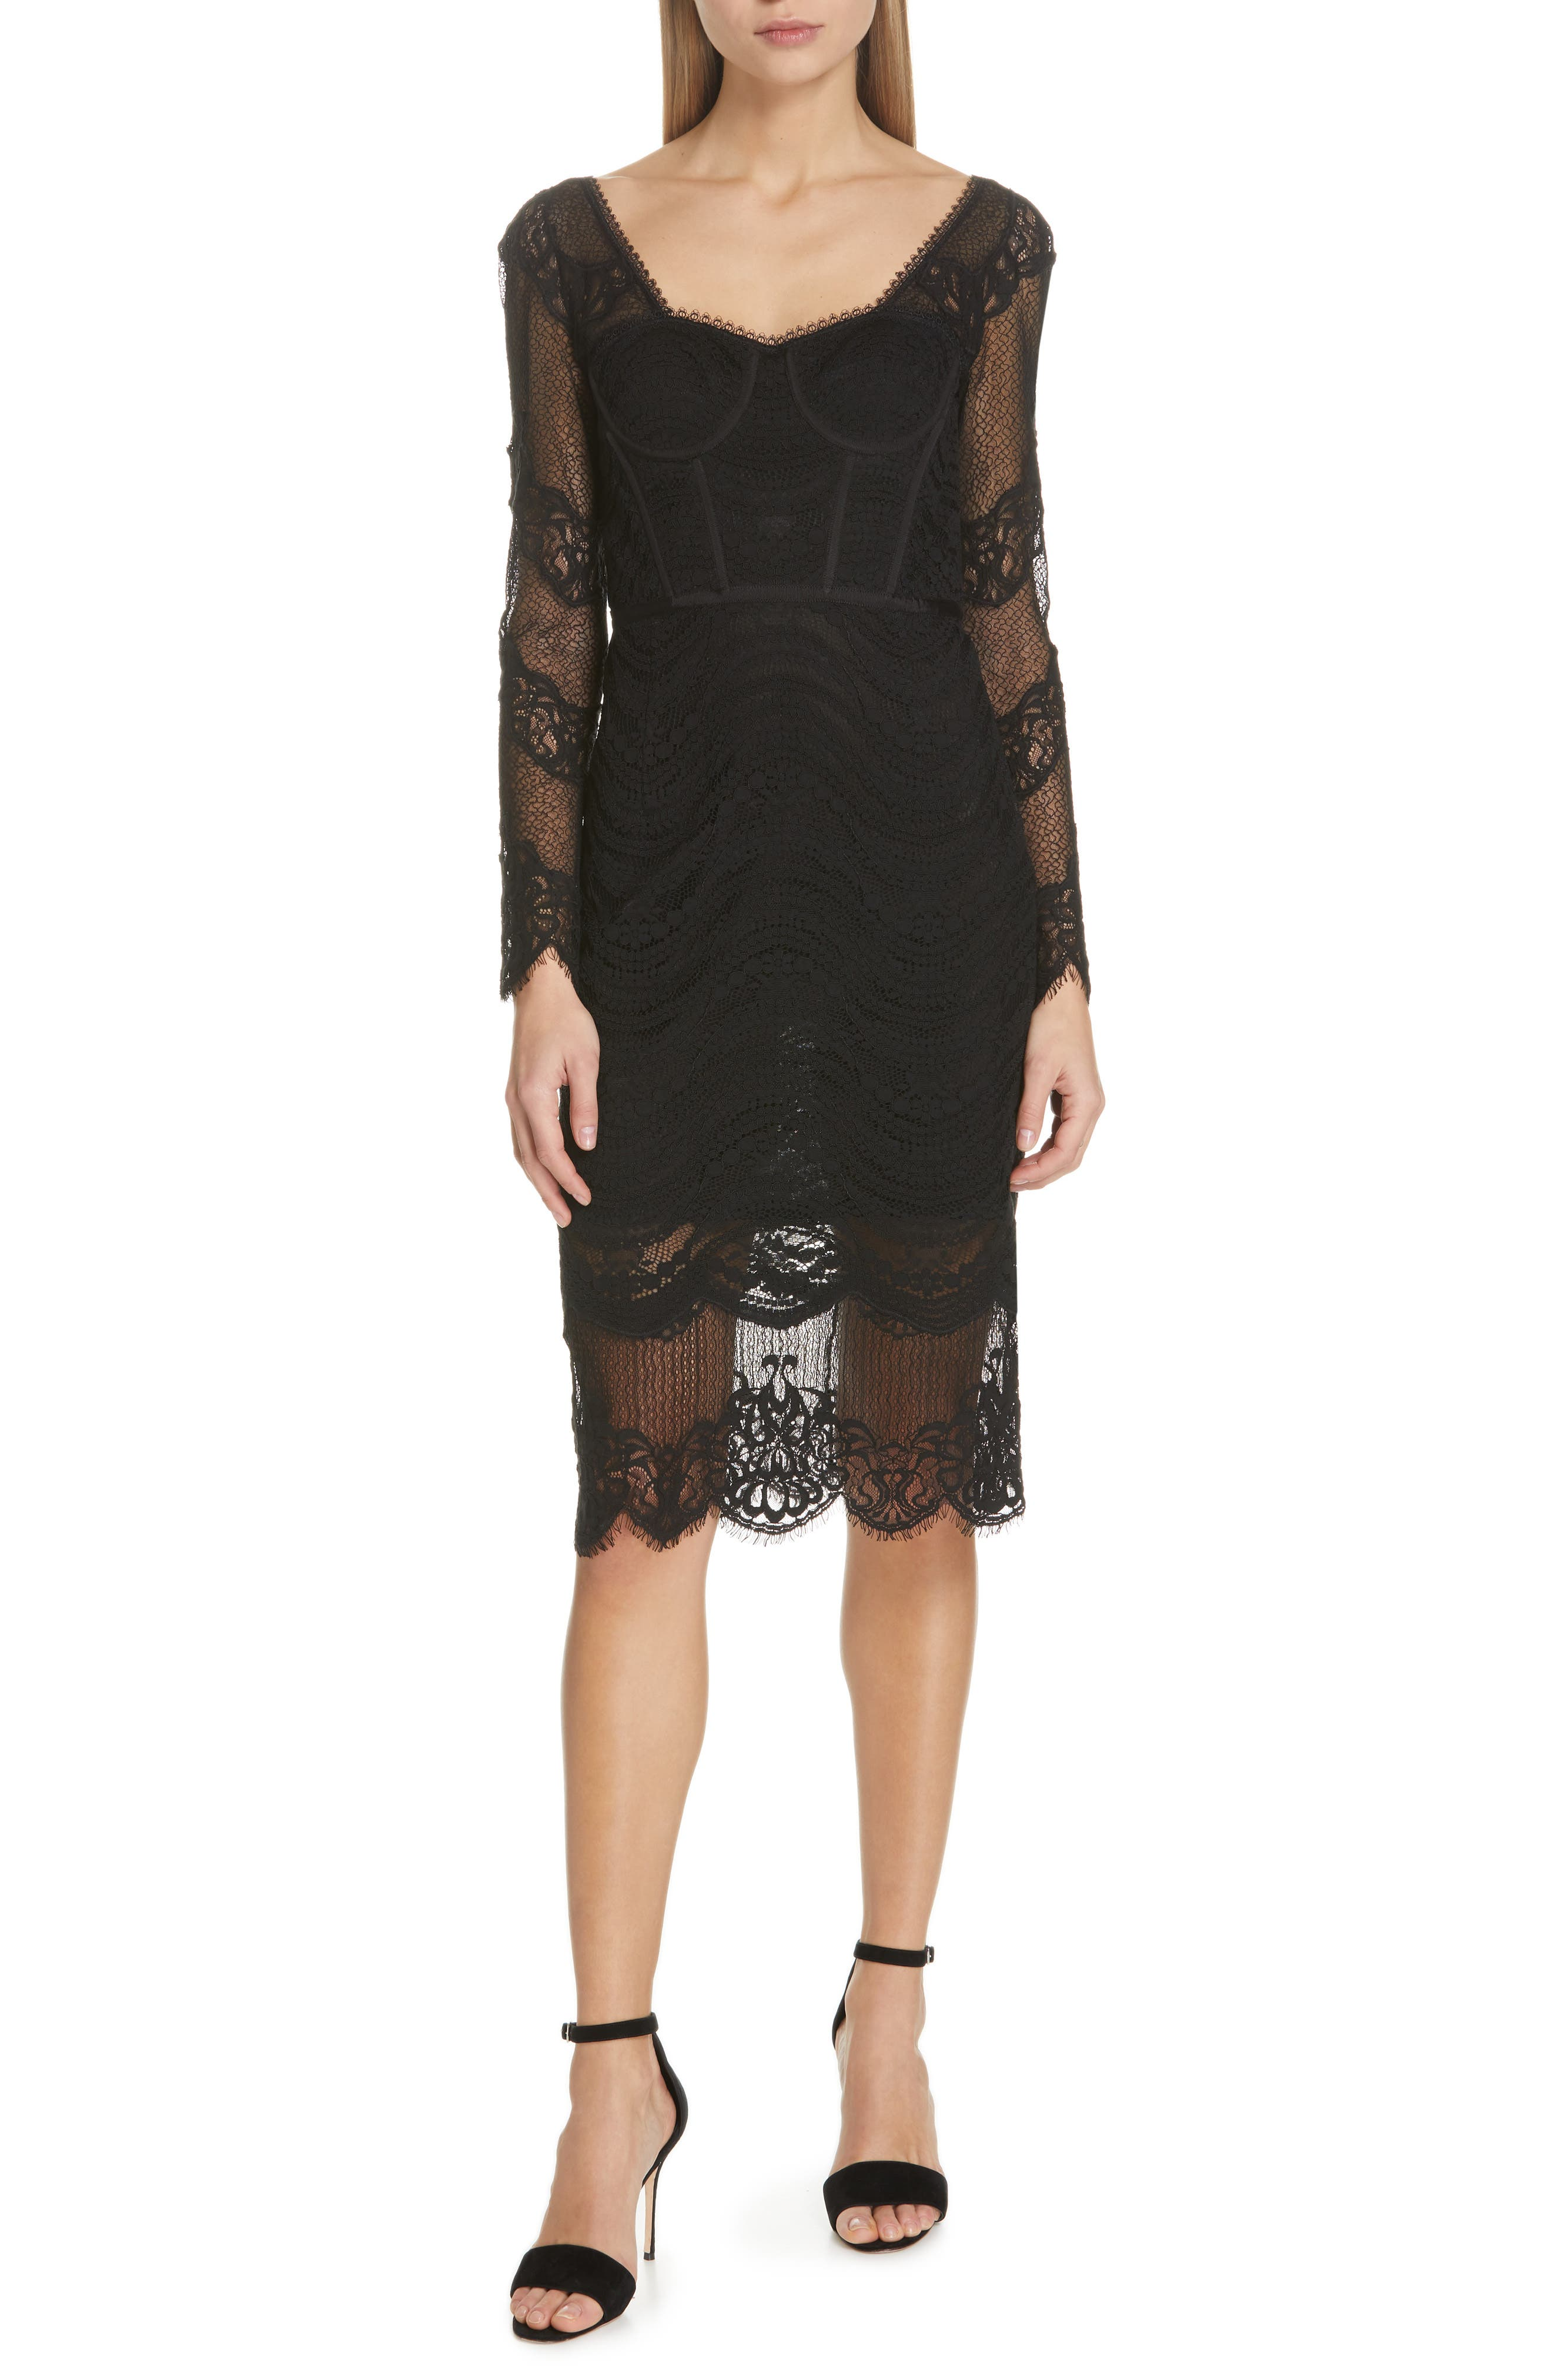 JONATHAN SIMKHAI,                             Lace Bustier Bodysuit Dress,                             Main thumbnail 1, color,                             BLACK